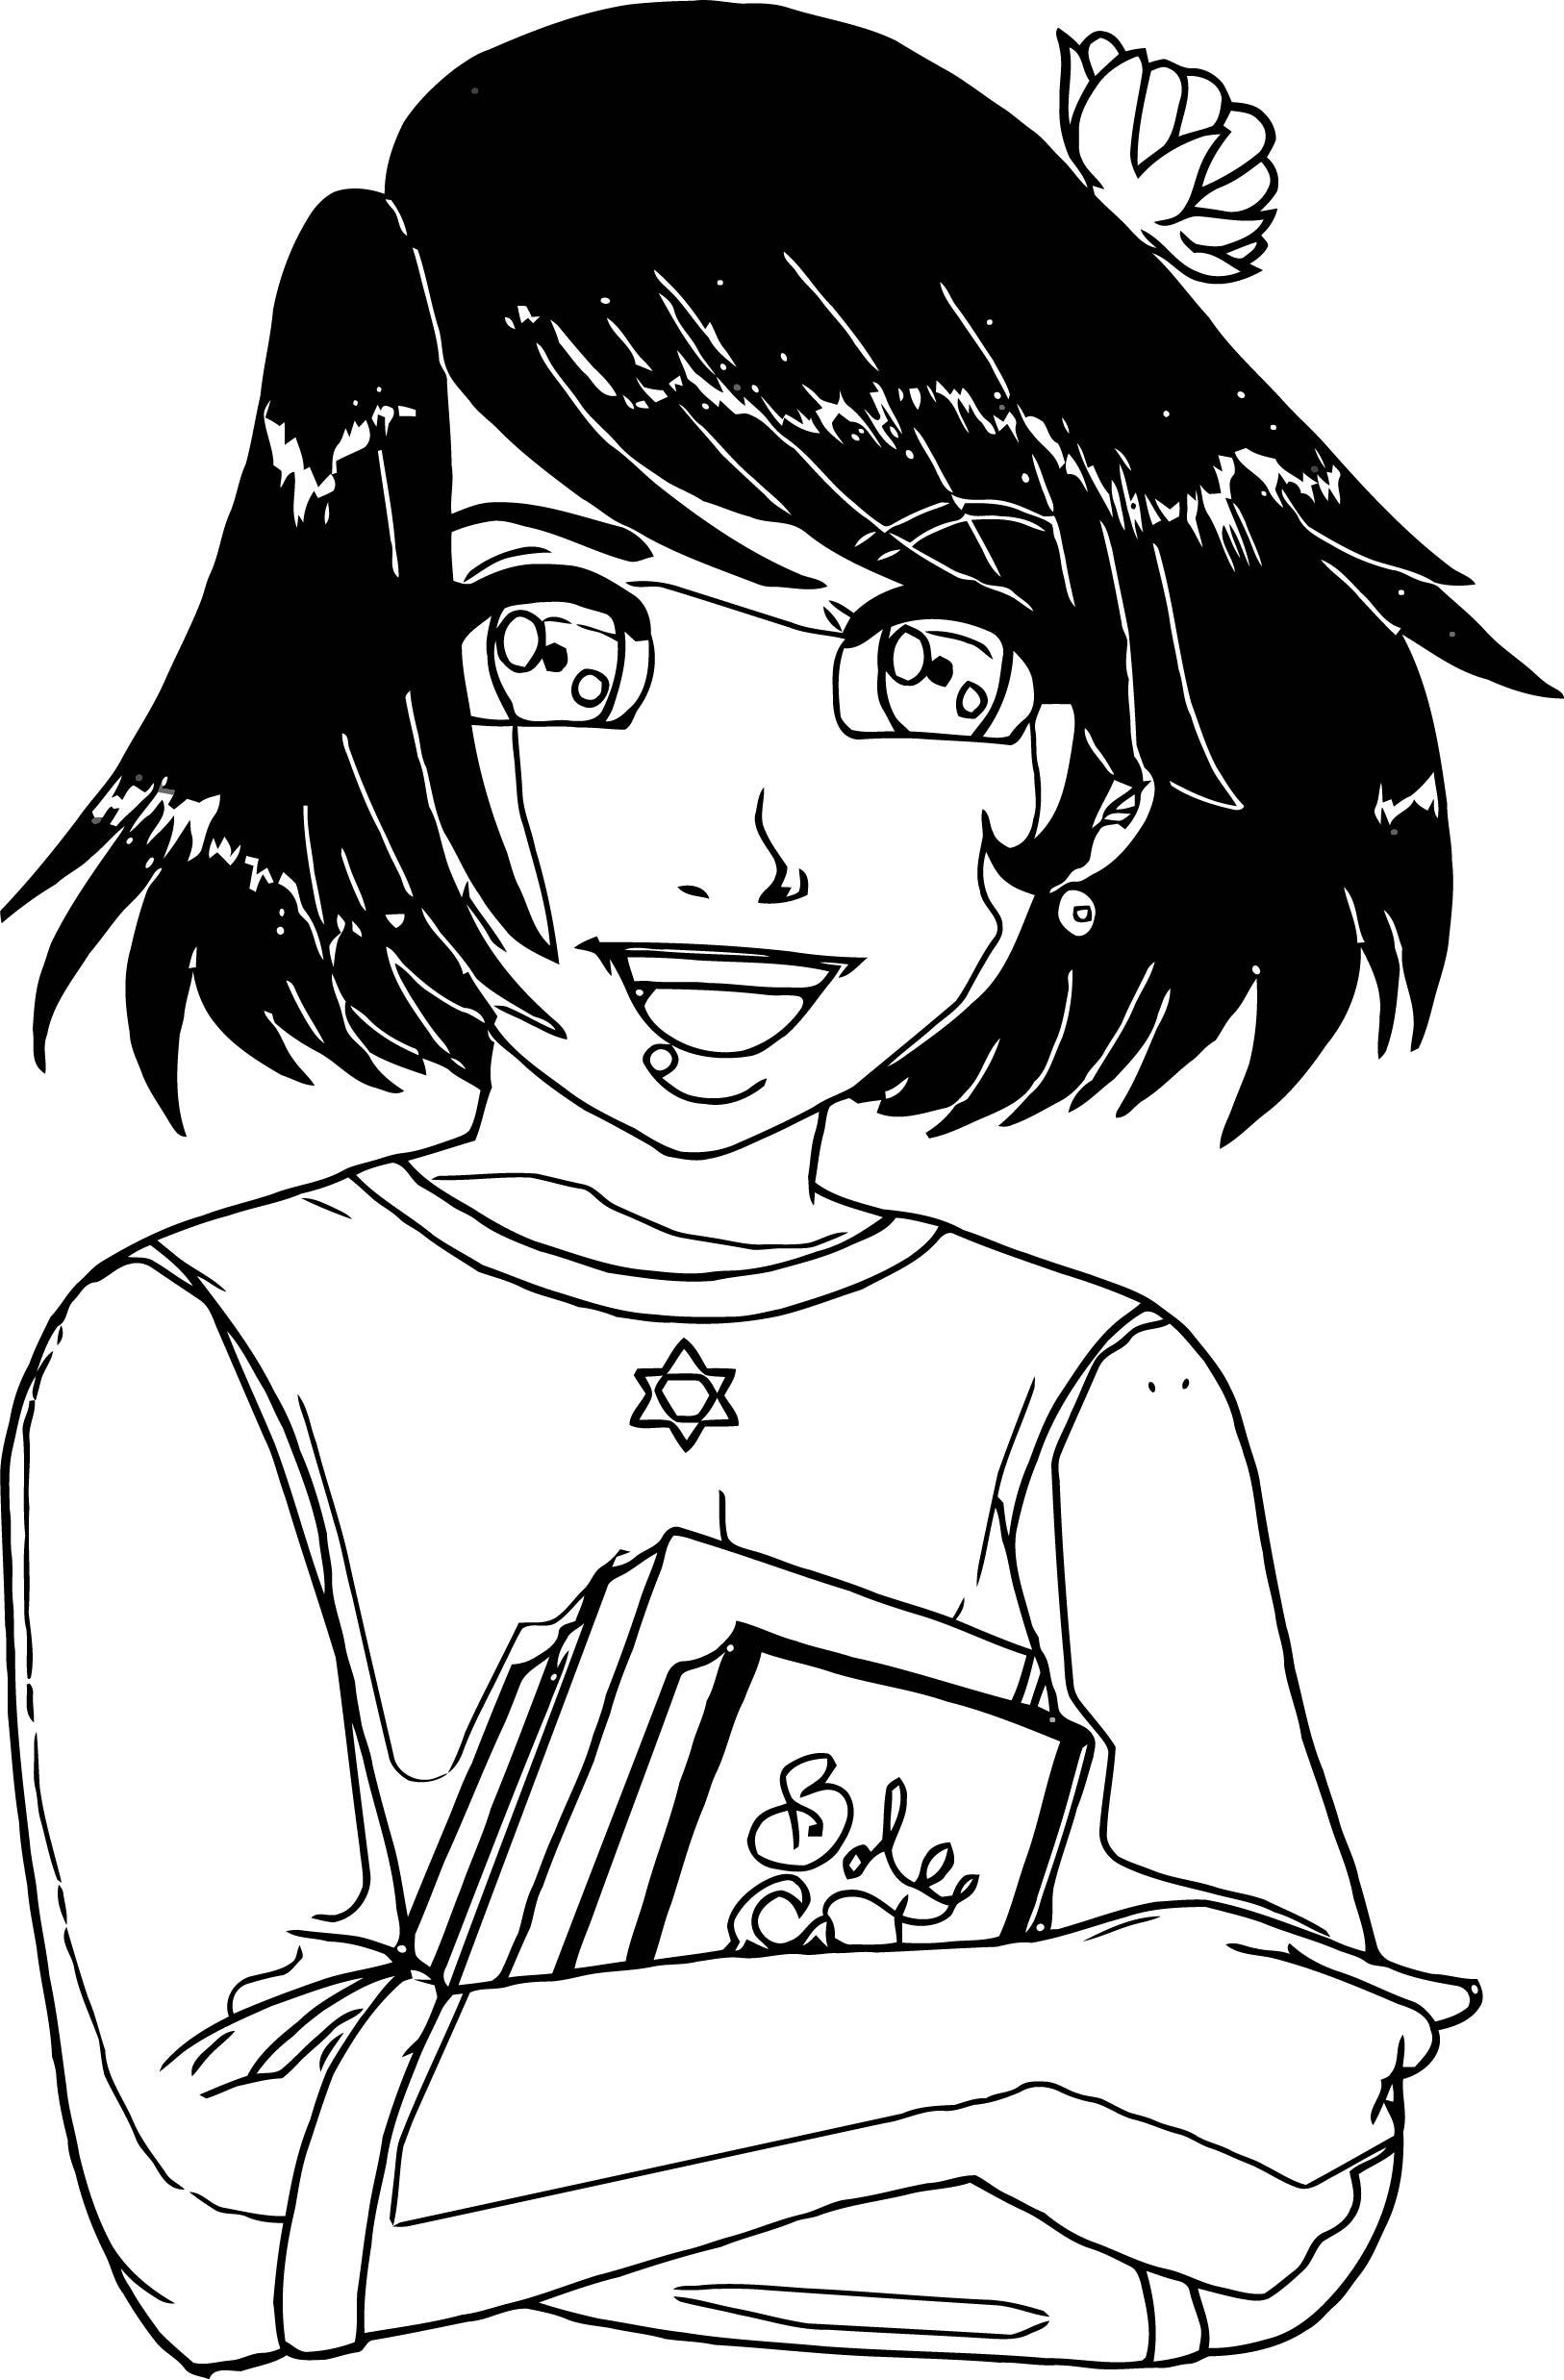 Manga Black Hair Book Girl Coloring Page